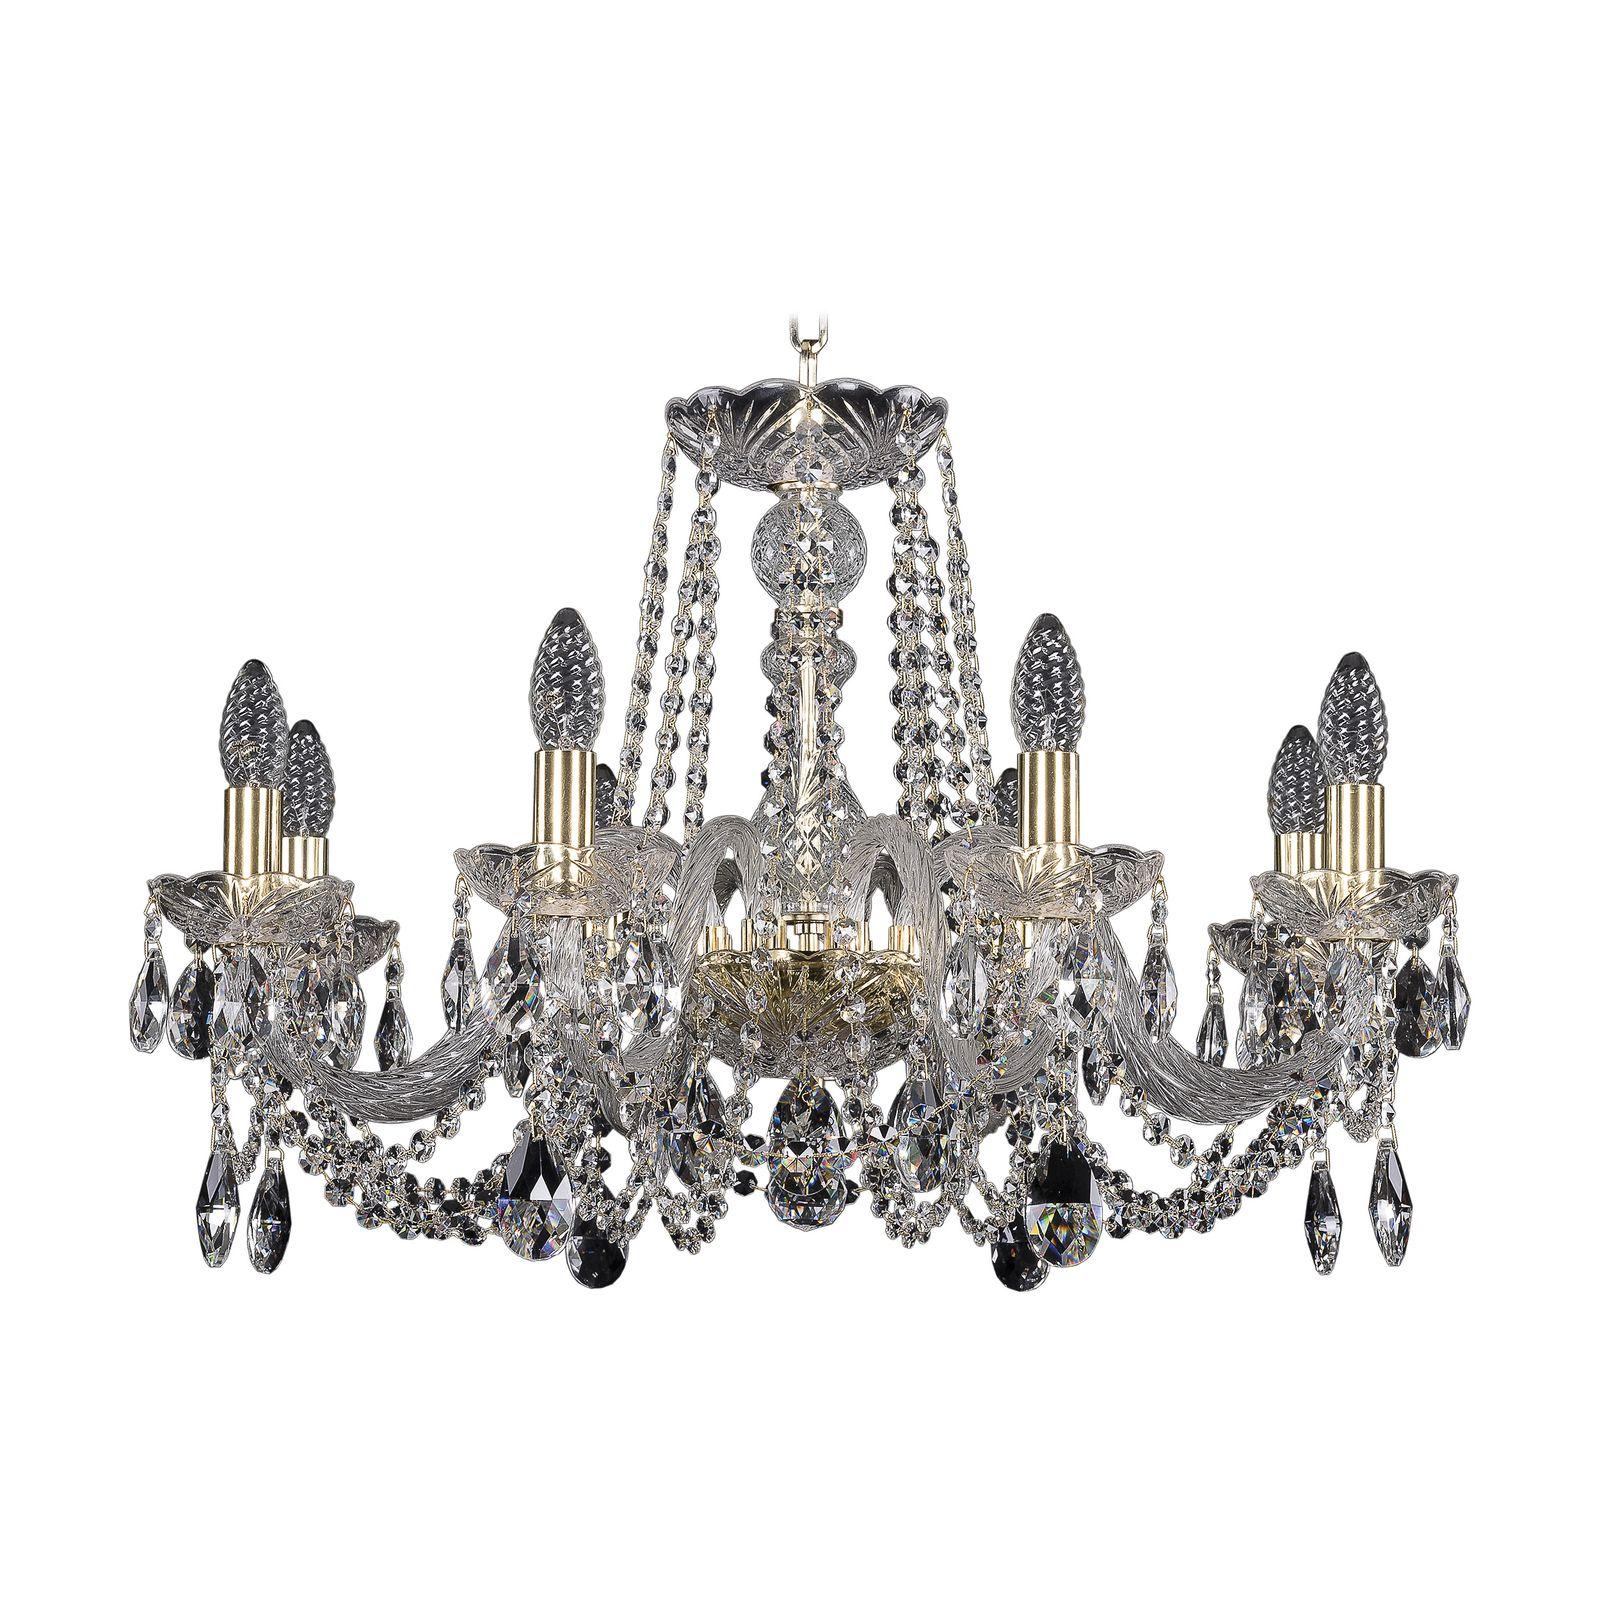 Потолочный светильник Bohemia Ivele Crystal 1402/8/240 G, E14, 40 Вт bohemia ivele crystal 1932 75z g